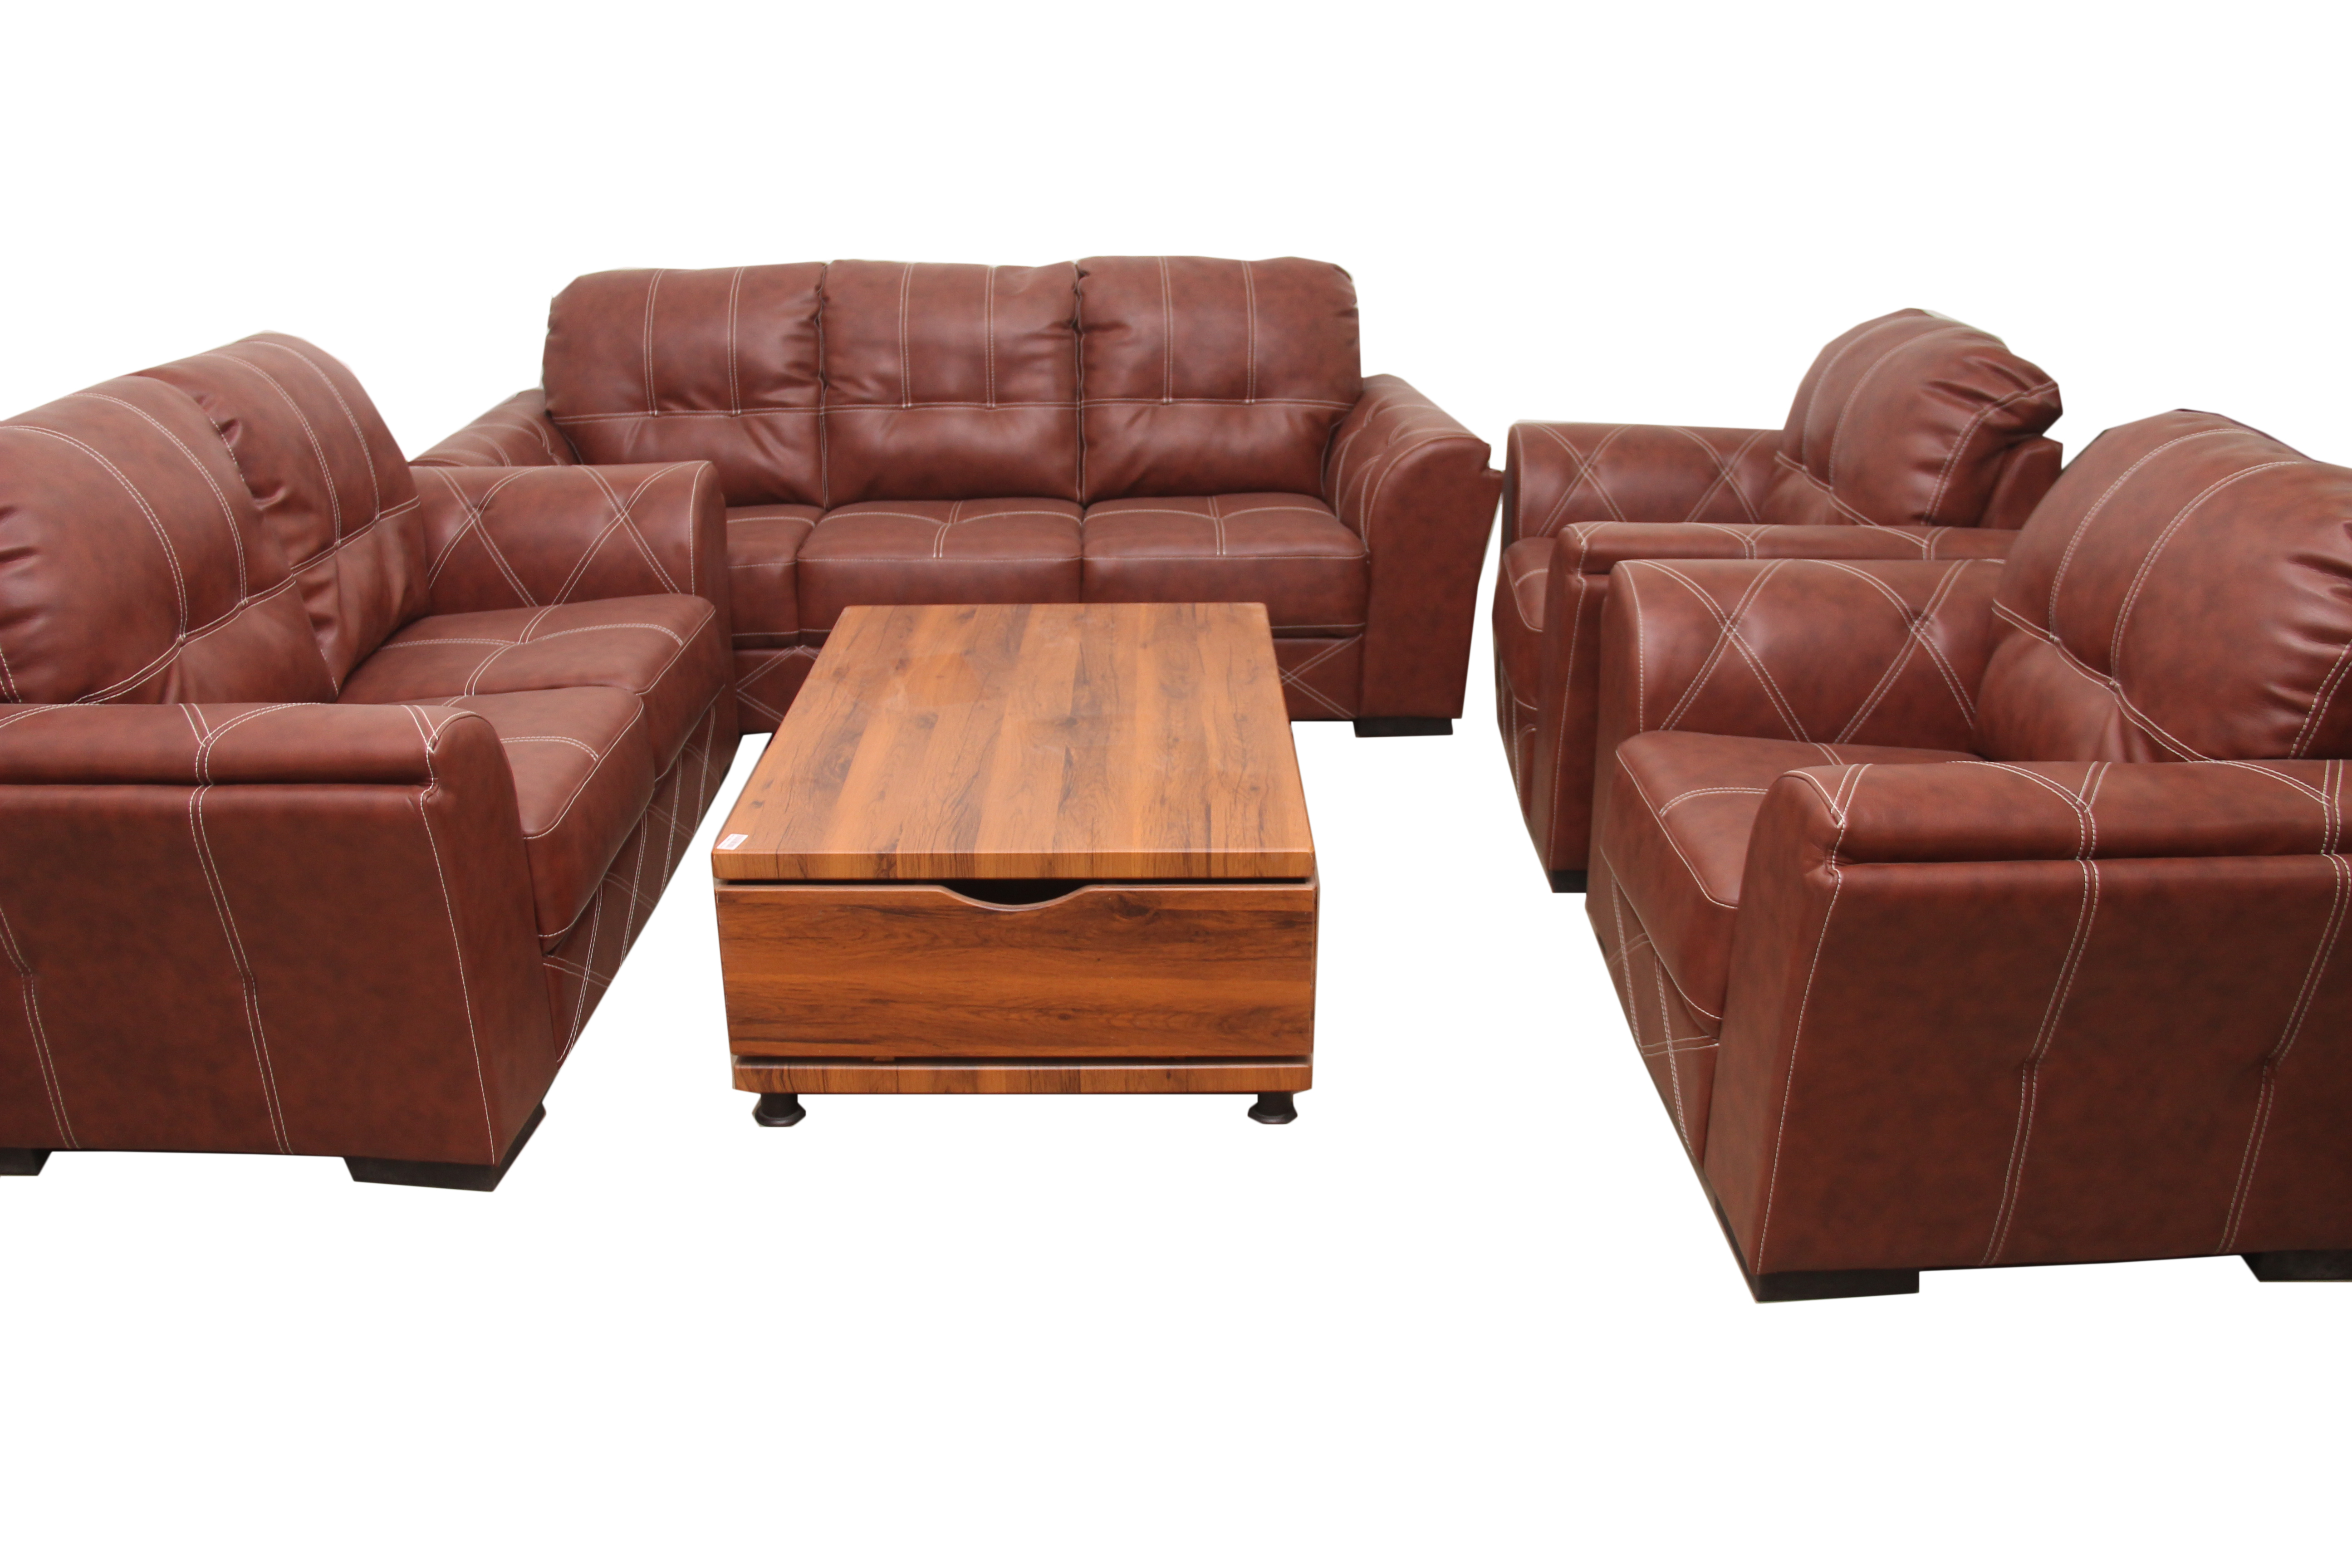 Gloria Brown 7 Seater Leather Sofa Set On Homewox Ng